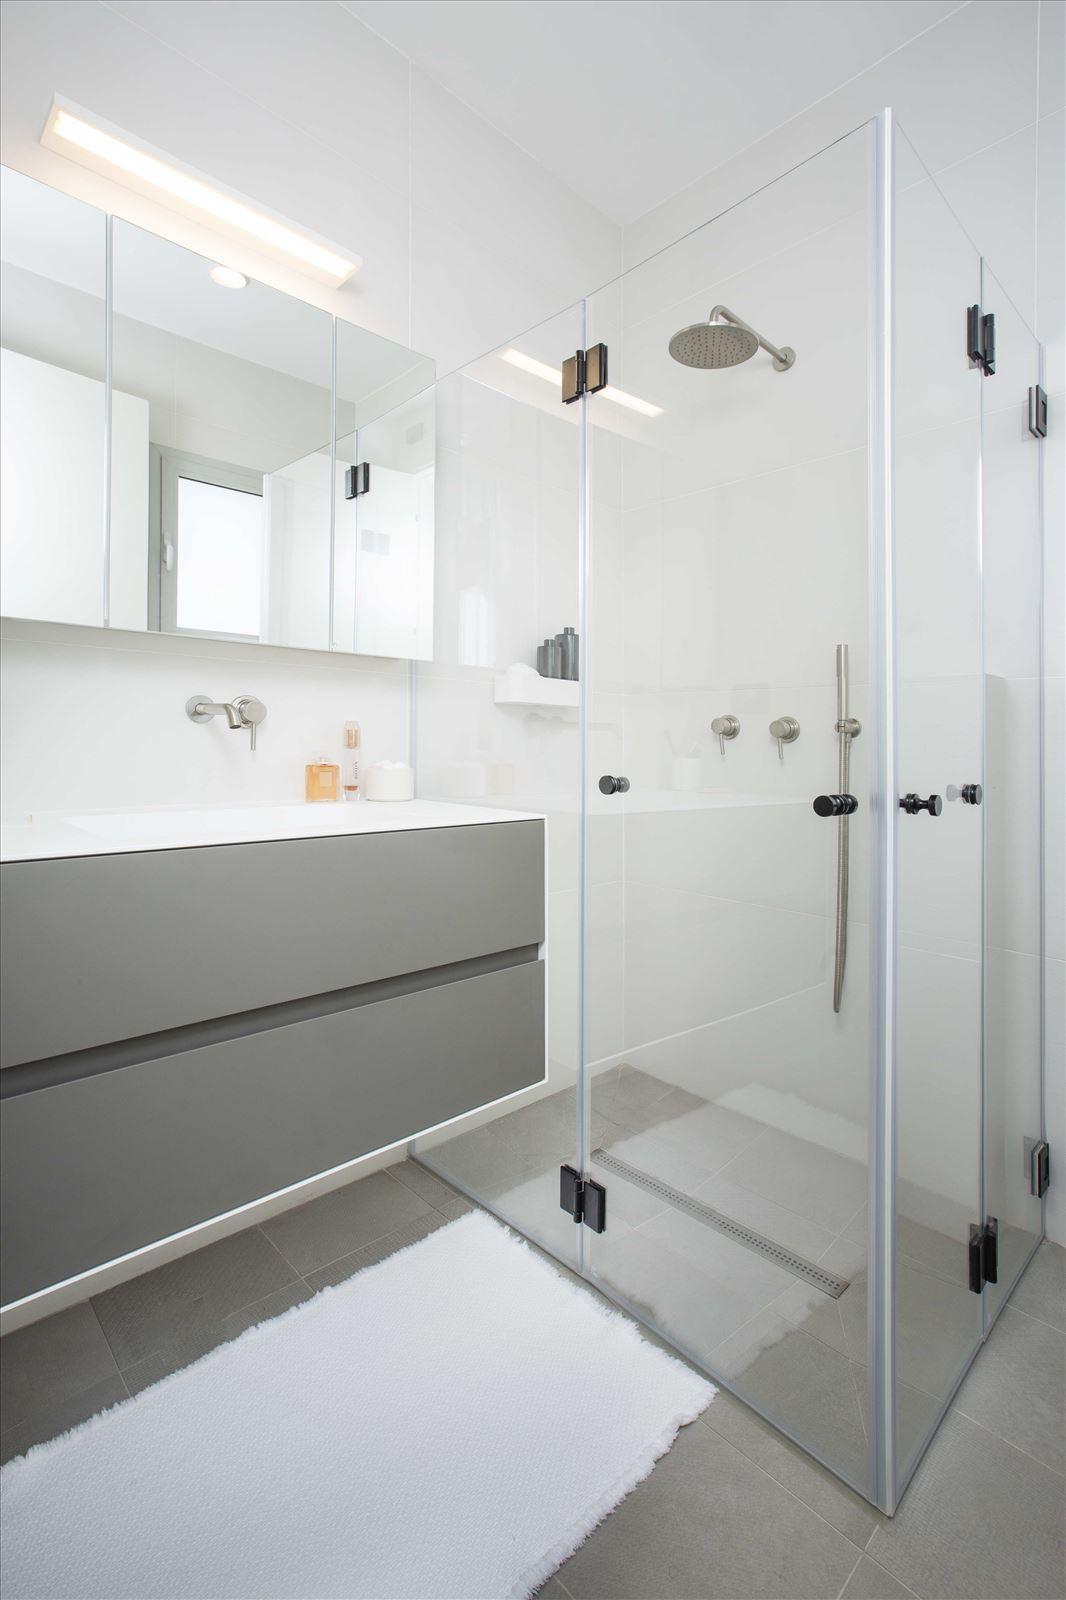 Tel Aviv apartment in Parisian aroma תאורה במקלחת על ידי דורי קמחי